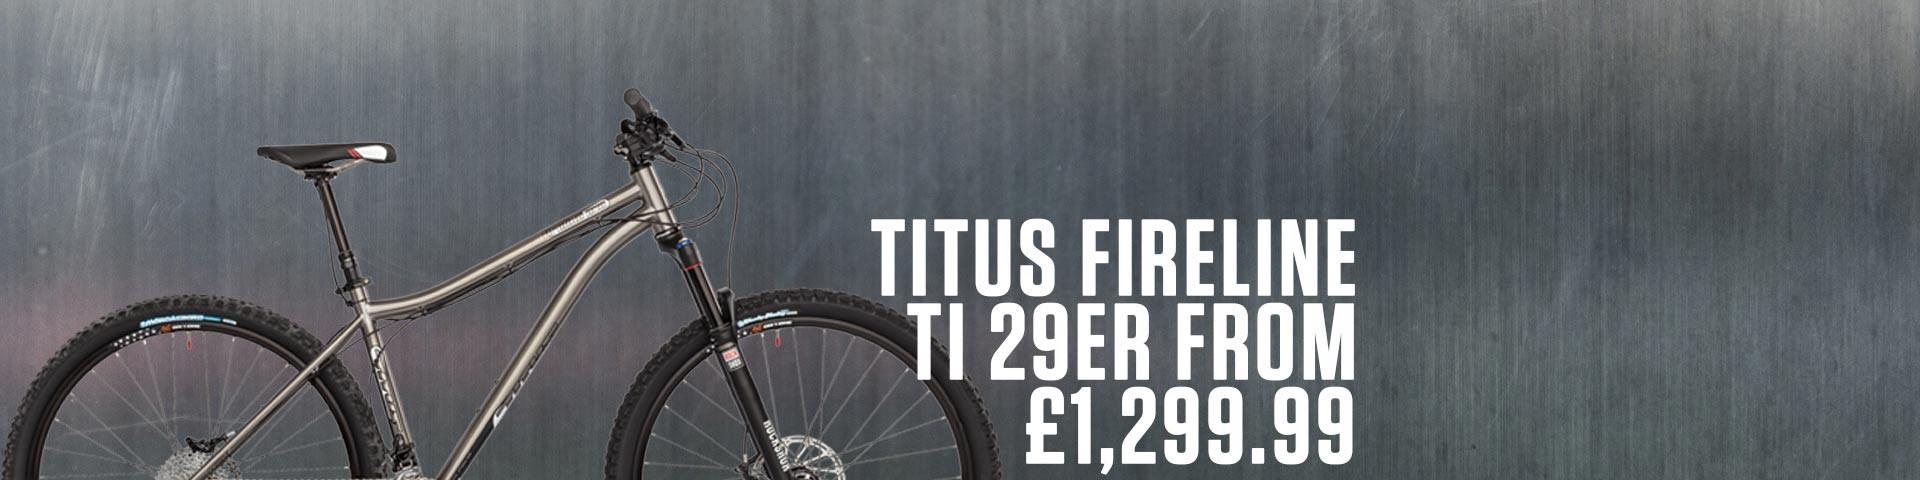 Tiutus Fireline Ti 29er